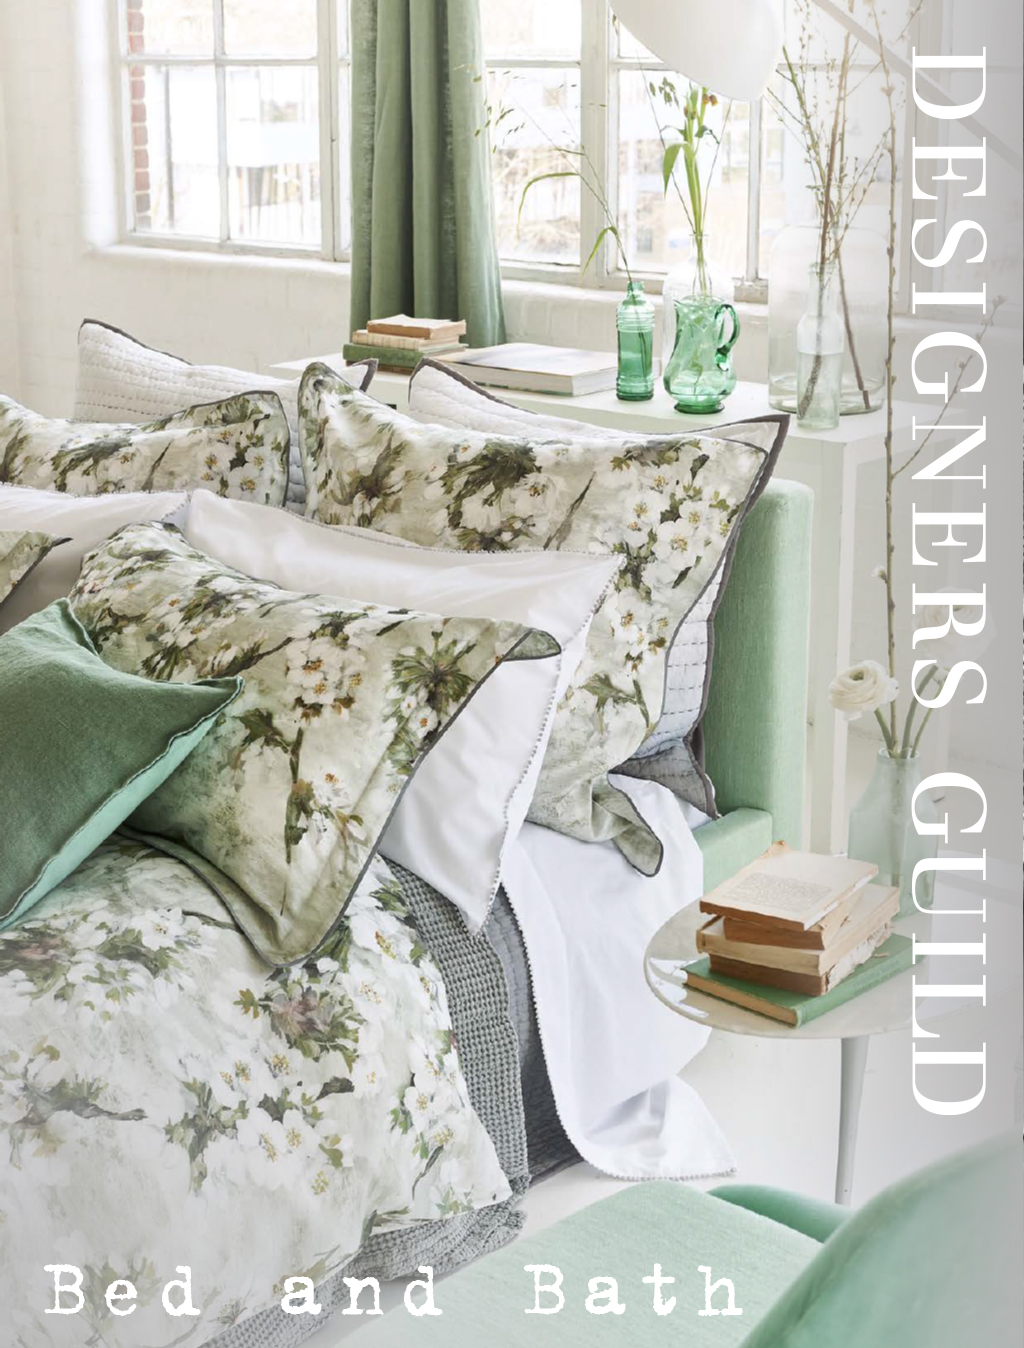 DESIGNERS GUILD Bed & Bath AUTUMN/WINTER 2021